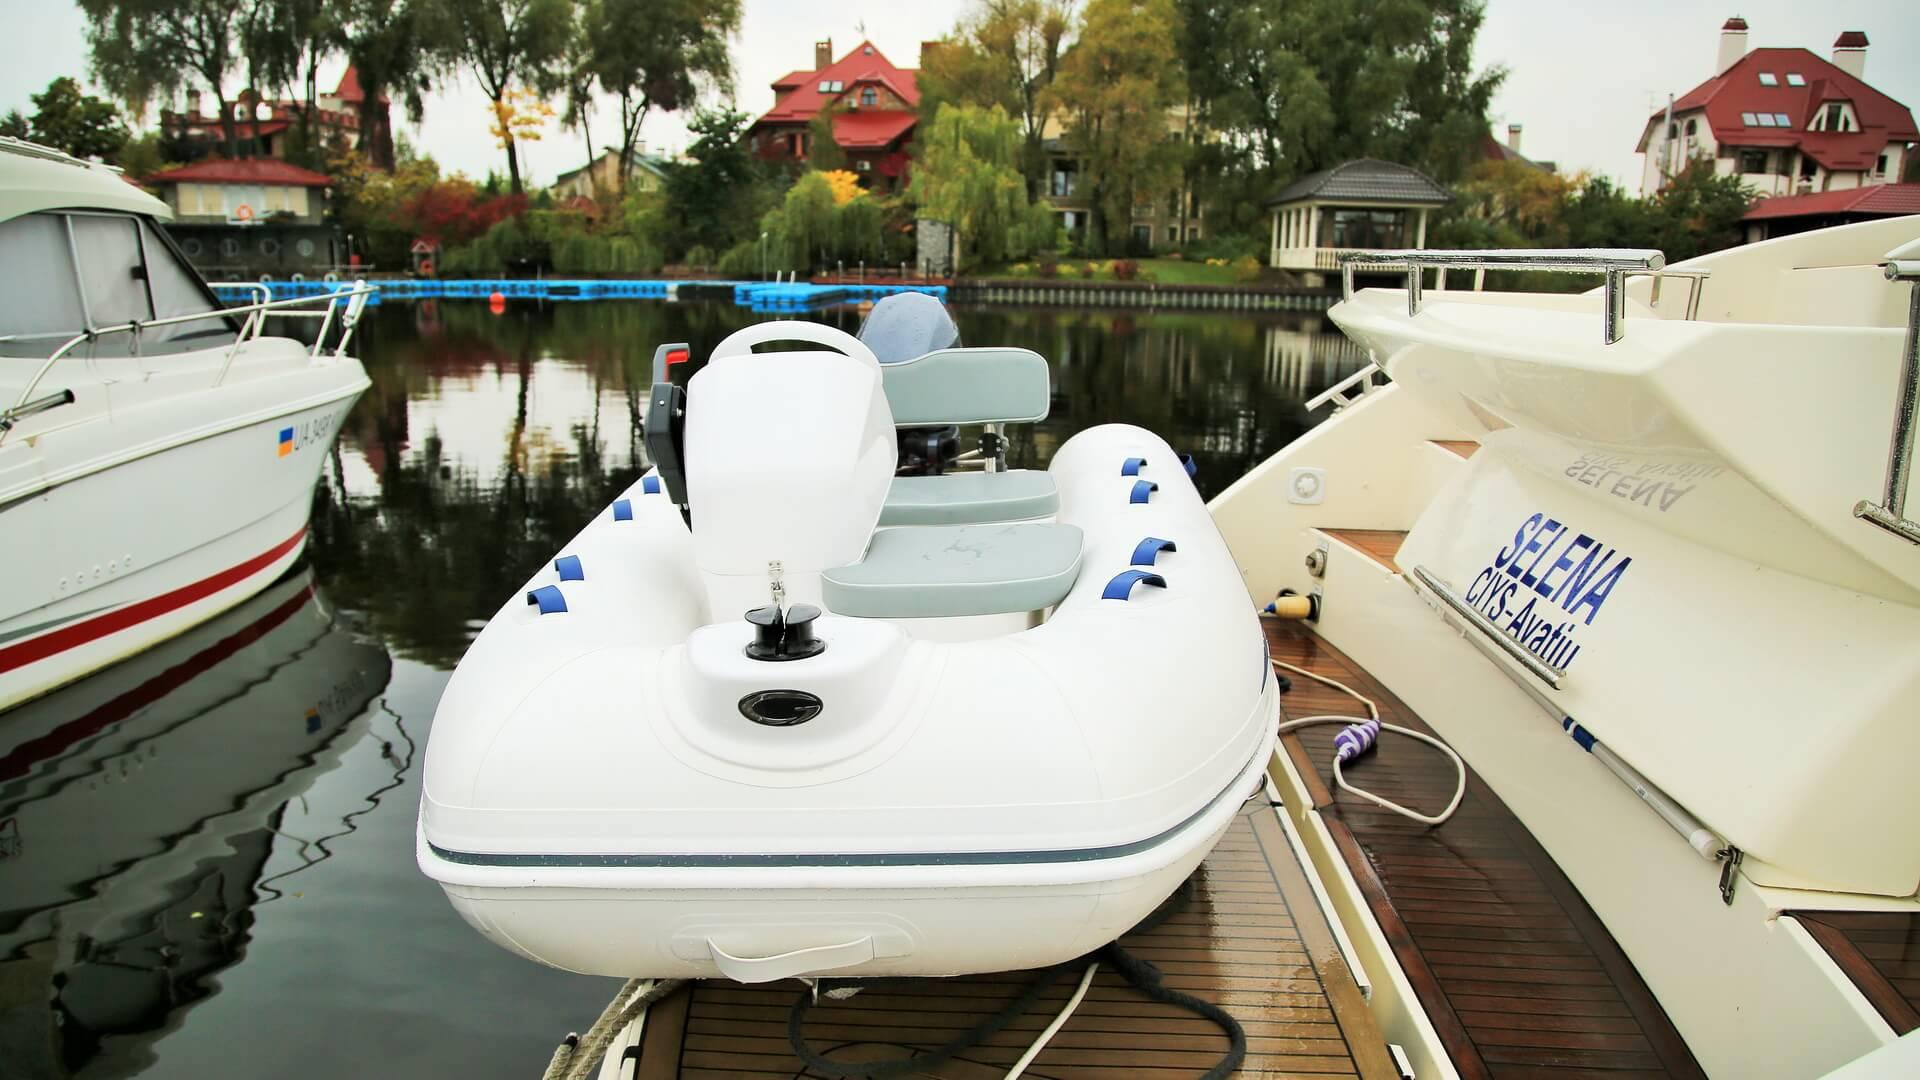 Надувная лодка с жестким дном GRAND Silver Line S300L, Надувная лодка GRAND Silver Line S300L, GRAND Silver Line S300L, GRAND Silver Line S300LF, GRAND S300L, GRAND S300LF, GRAND S300, Надувная лодка GRAND, Надувная лодка ГРАНД, Надувная лодка с жестким дном, RIB, Rigid Inflatable Boats